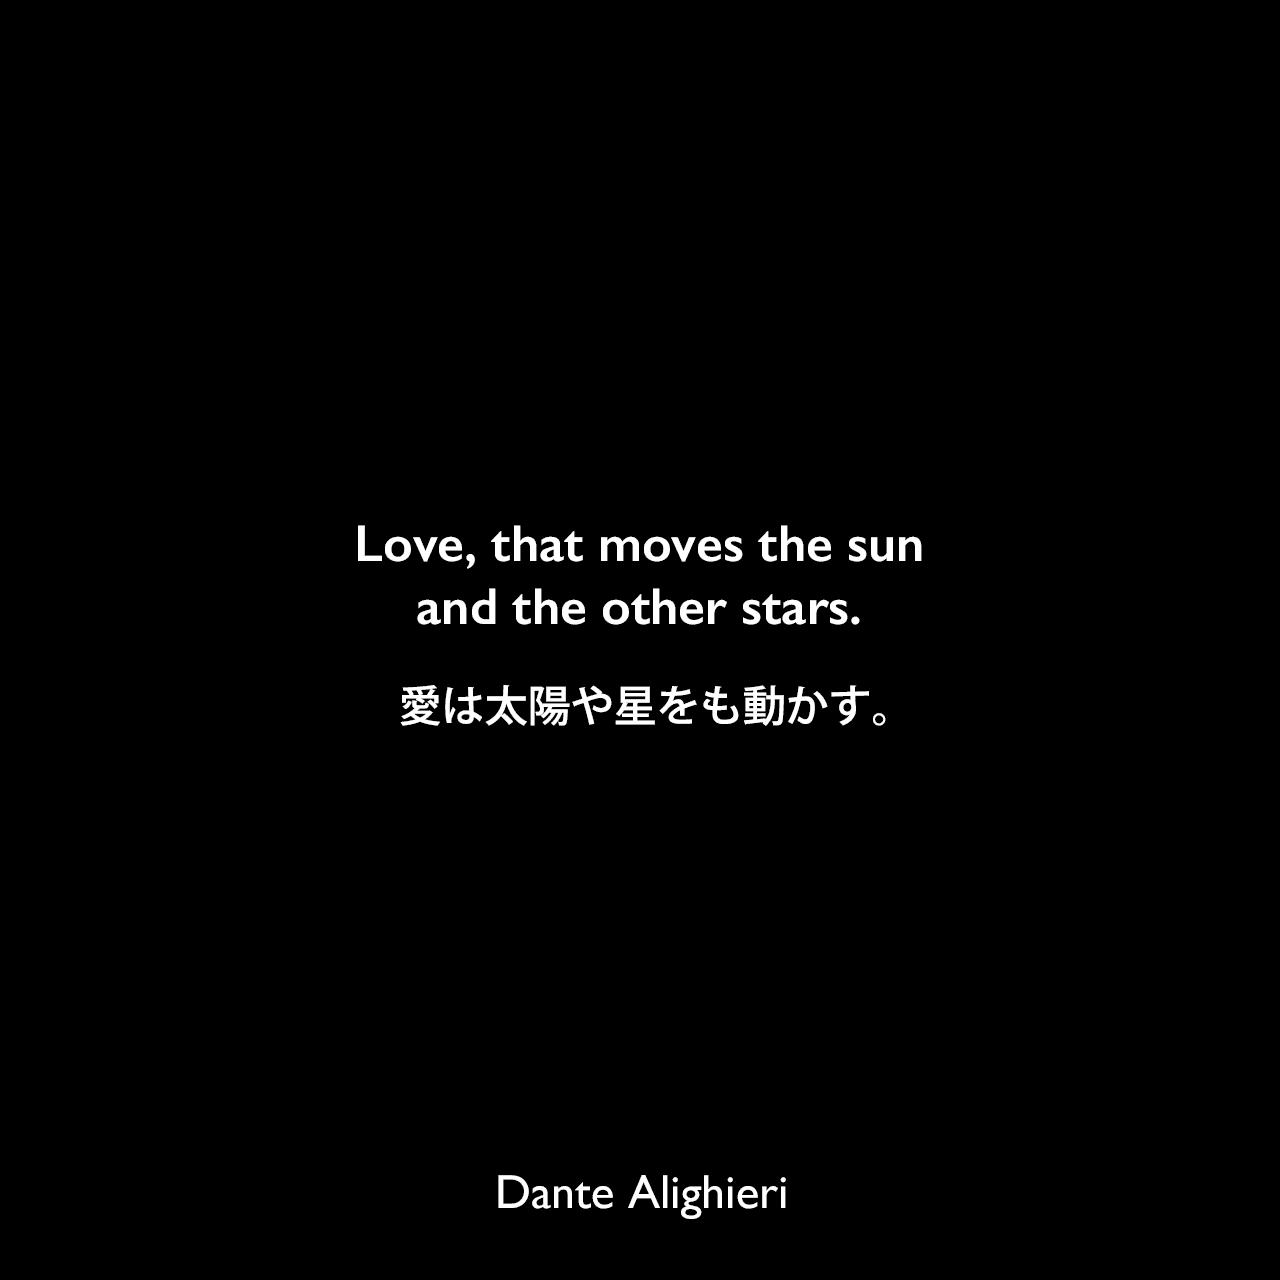 Love, that moves the sun and the other stars.愛は太陽や星をも動かす。Dante Alighieri